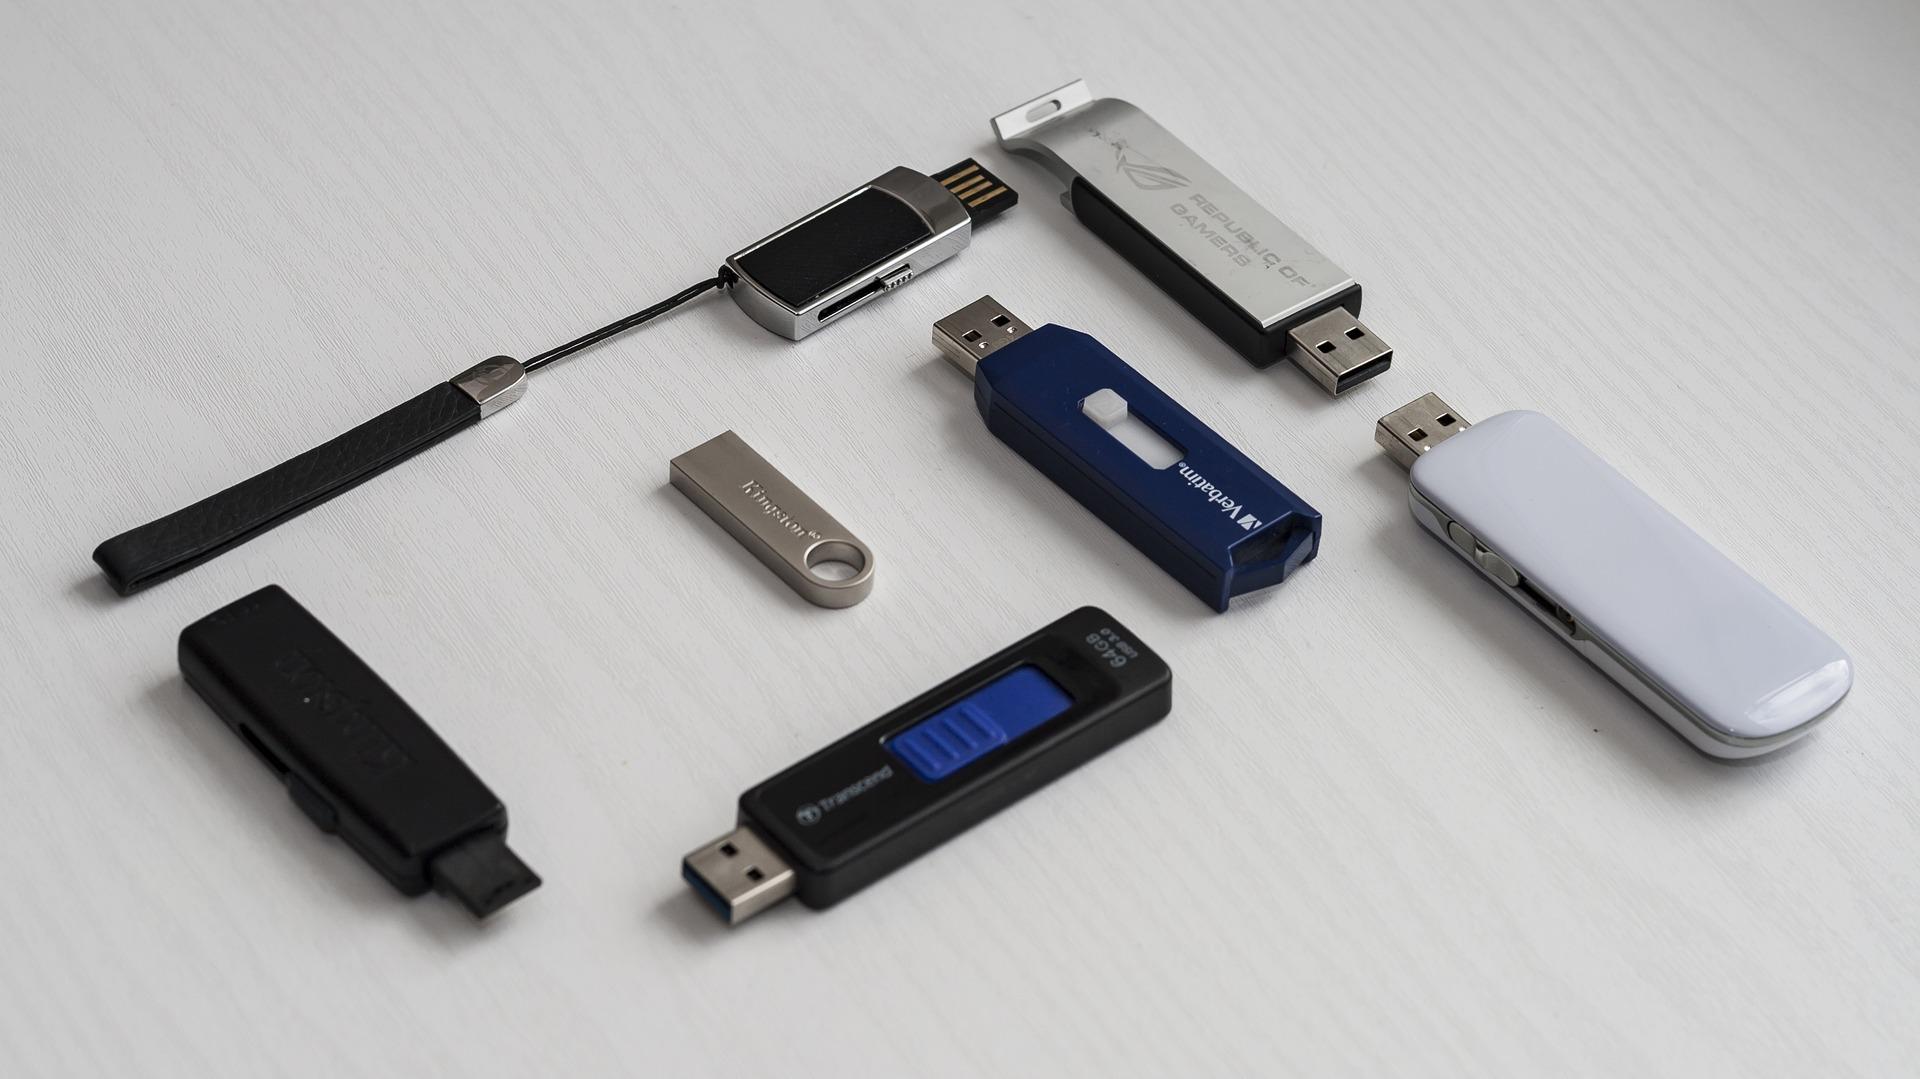 USB sticka